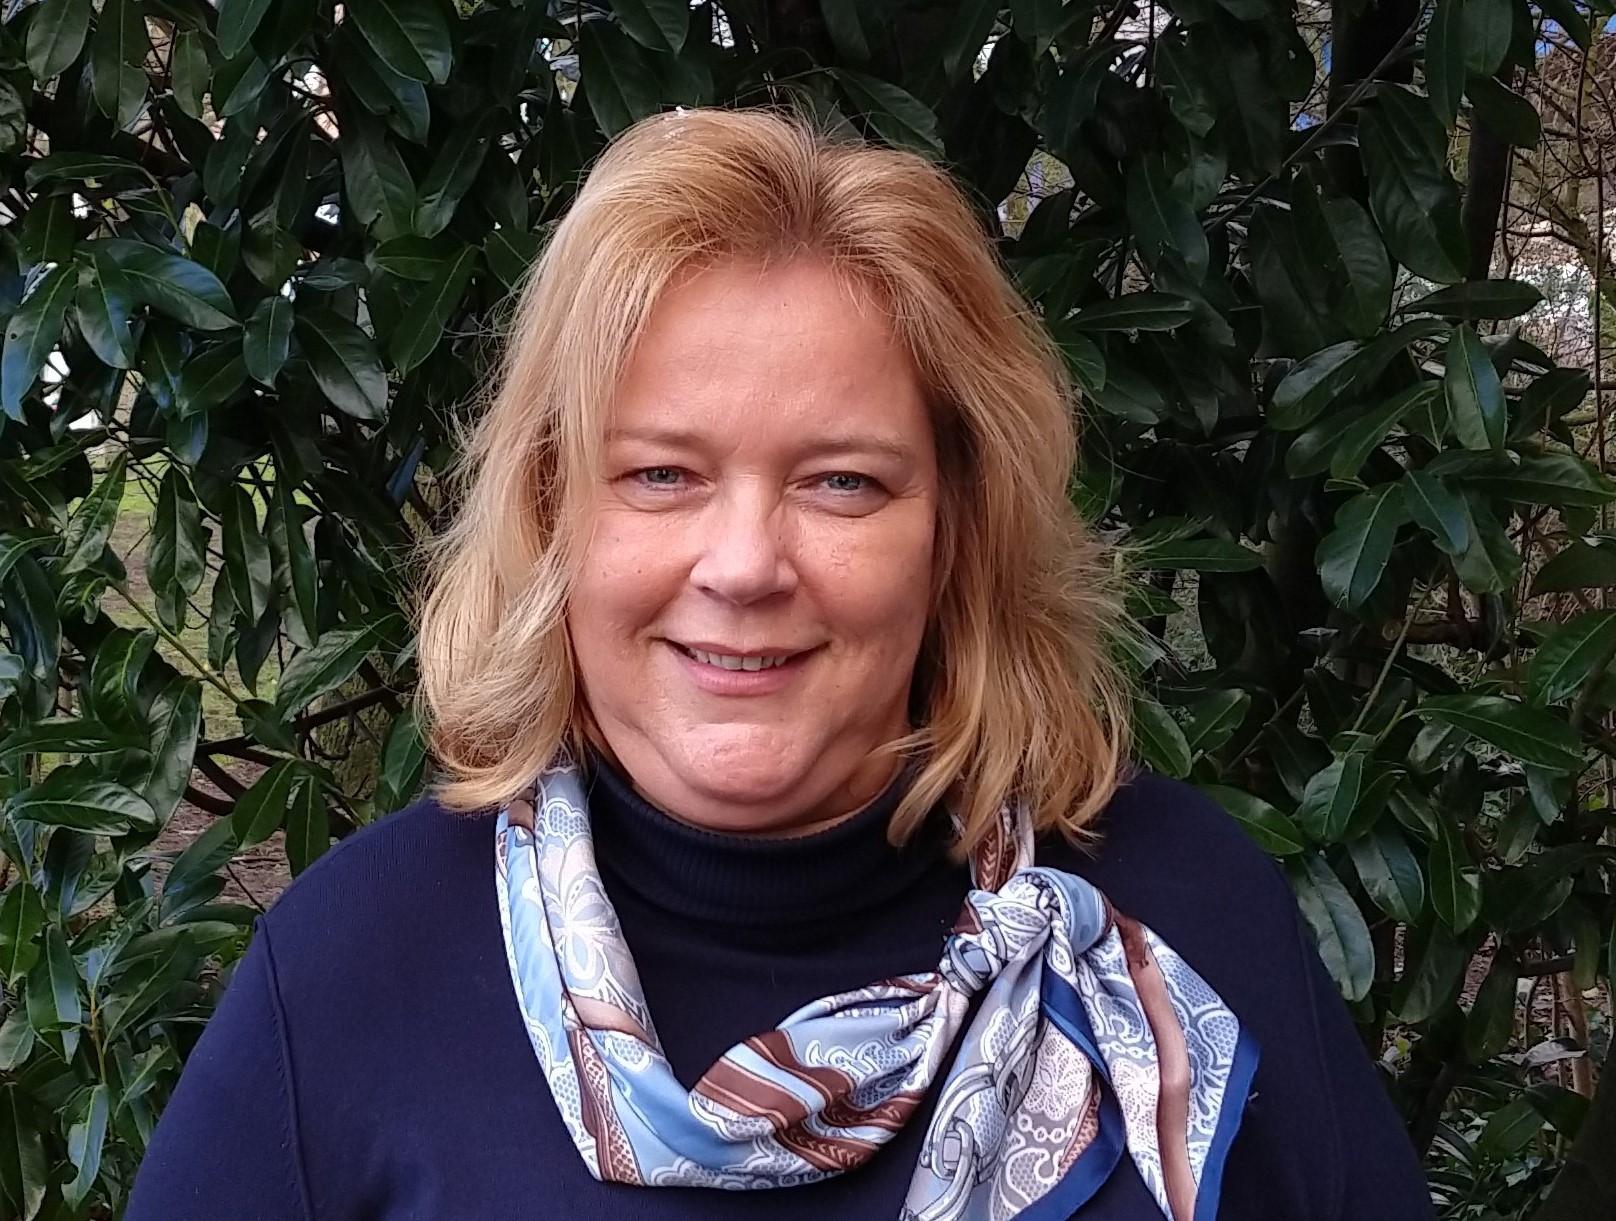 Esther Peeters